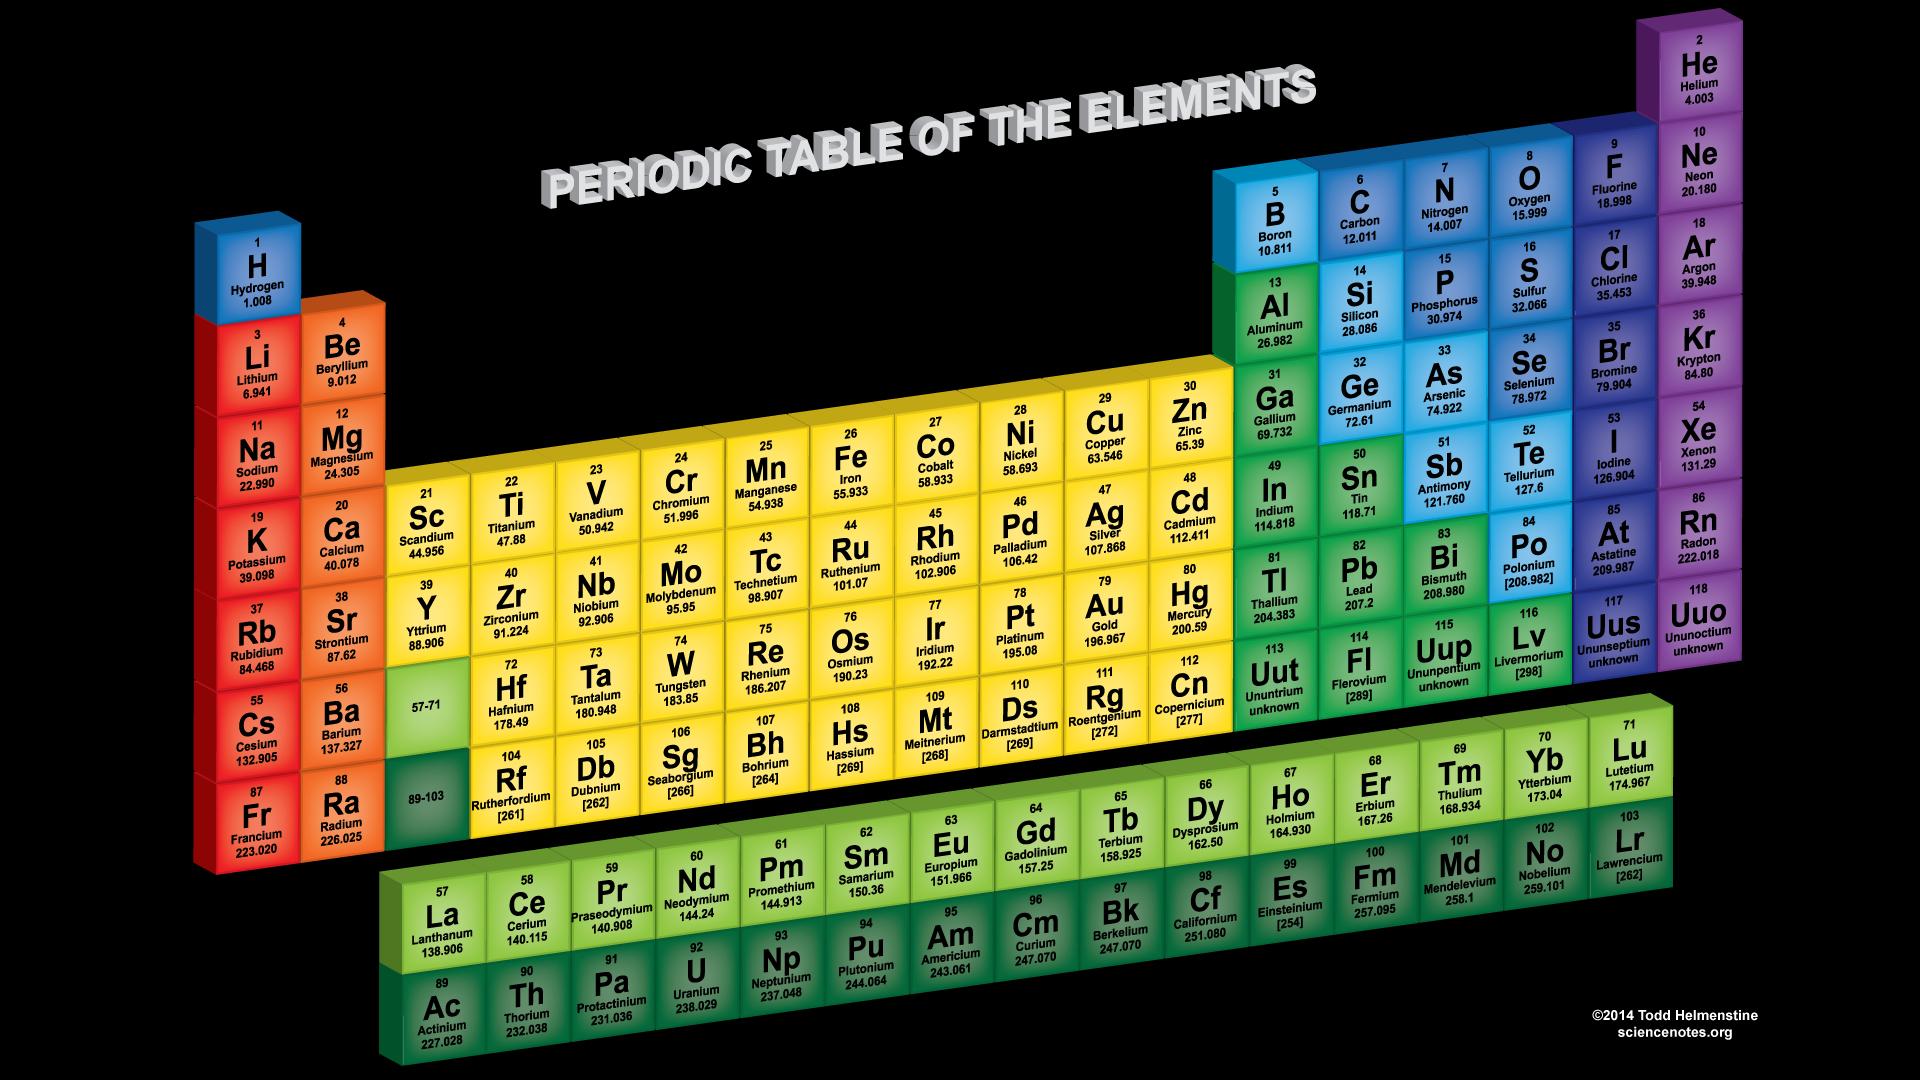 25 tabel periodik unsur kimia unik yang harus kamu miliki materi tabel periodik unsur kimia gambar 19 tabel periodik unsur kimia gambar 20 urtaz Image collections